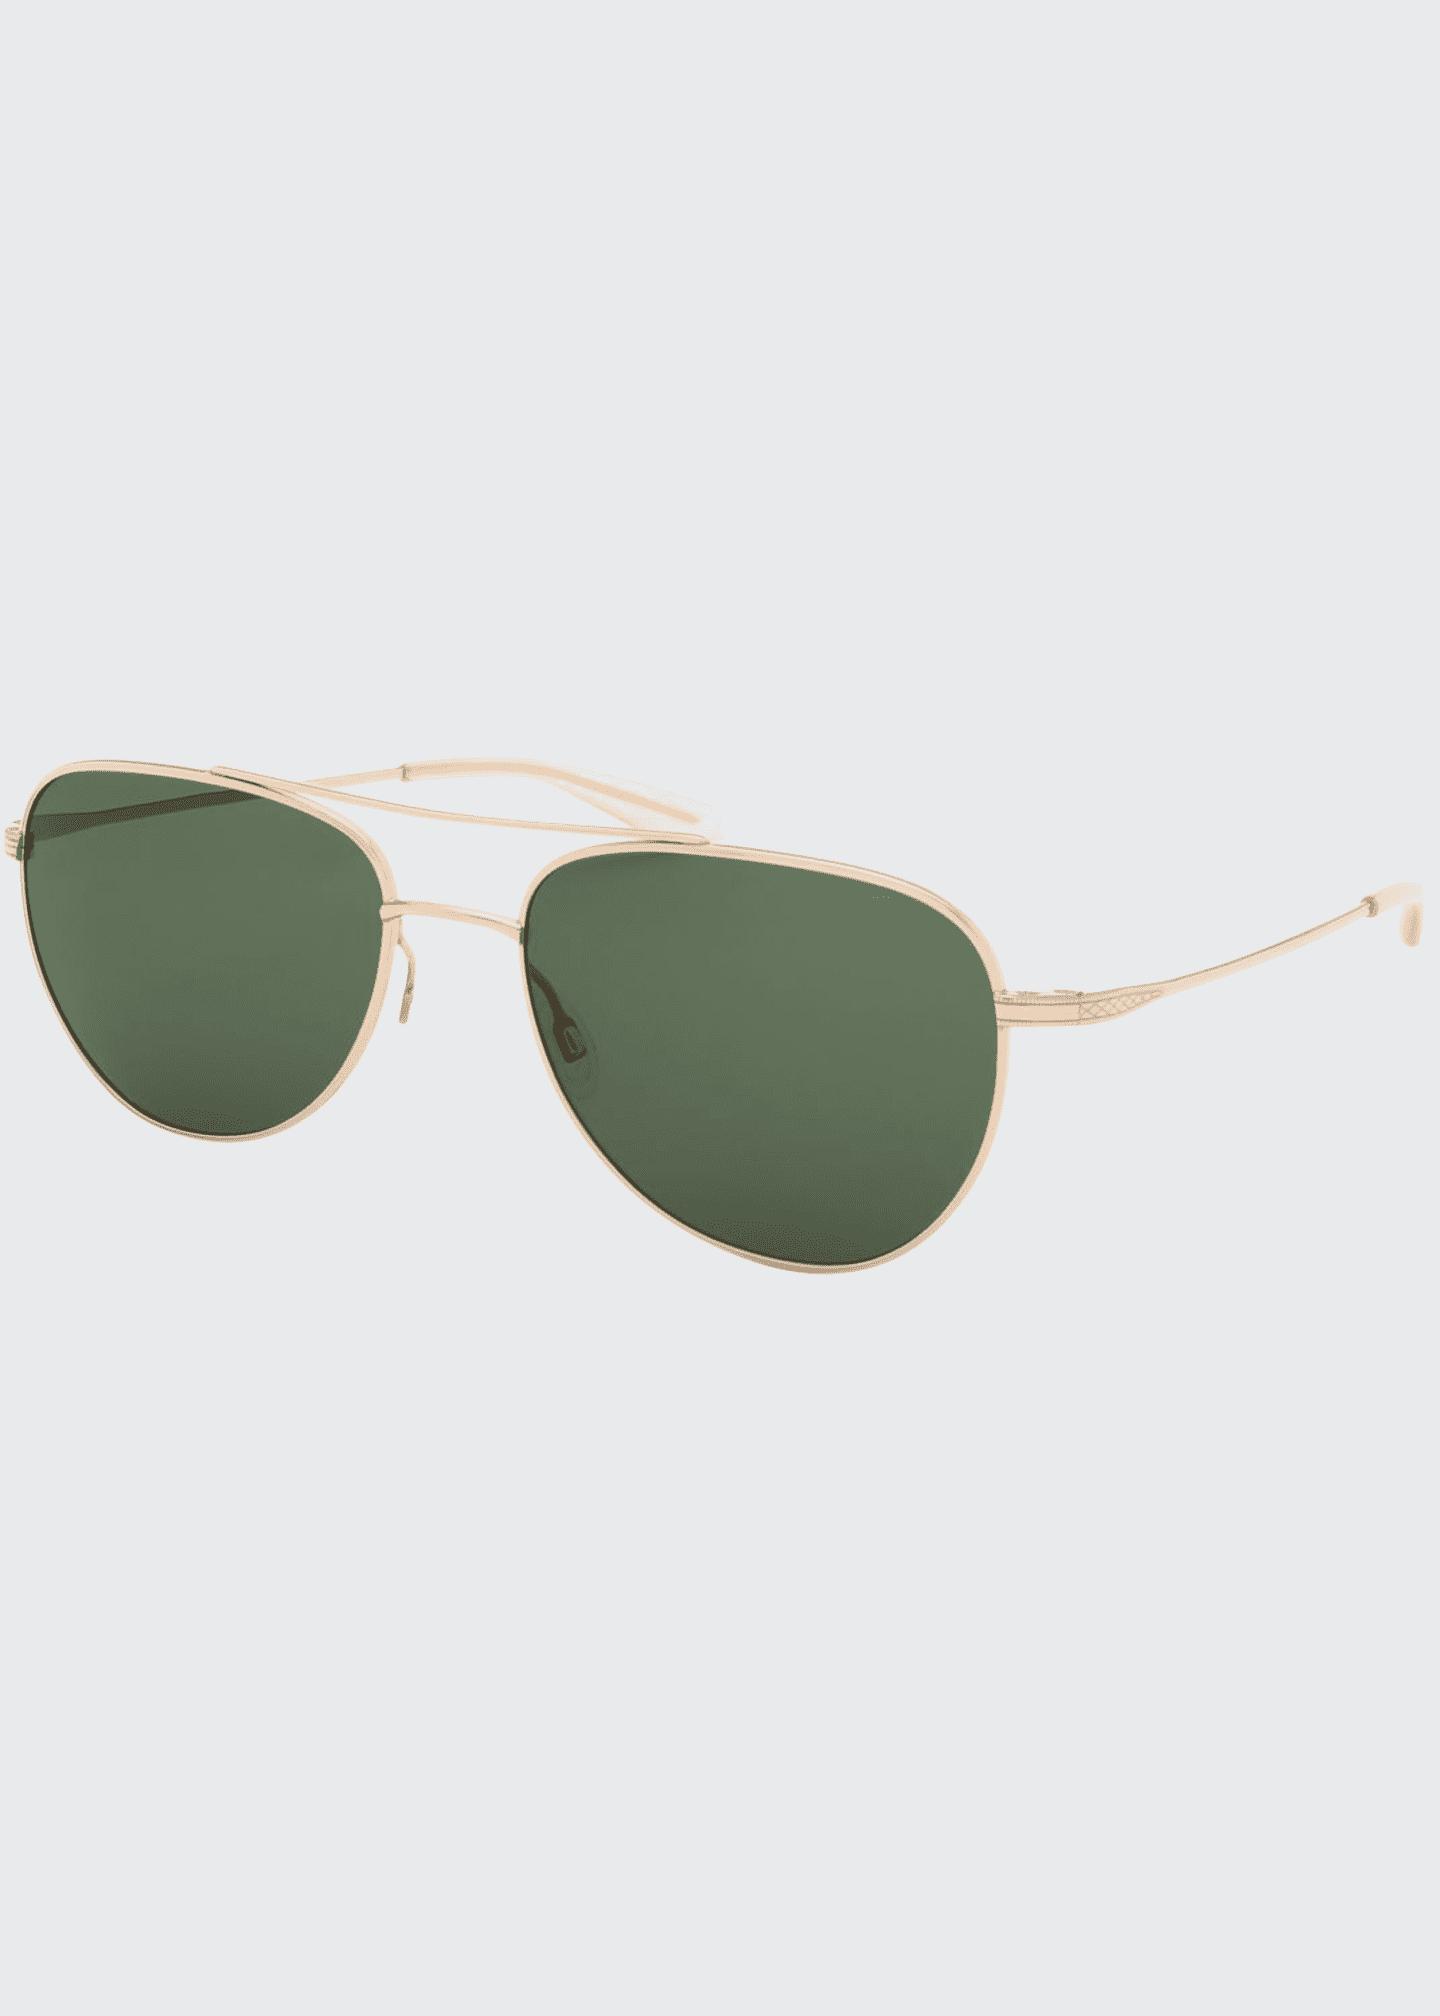 Barton Perreira Men's Aerial Metal Aviator Sunglasses